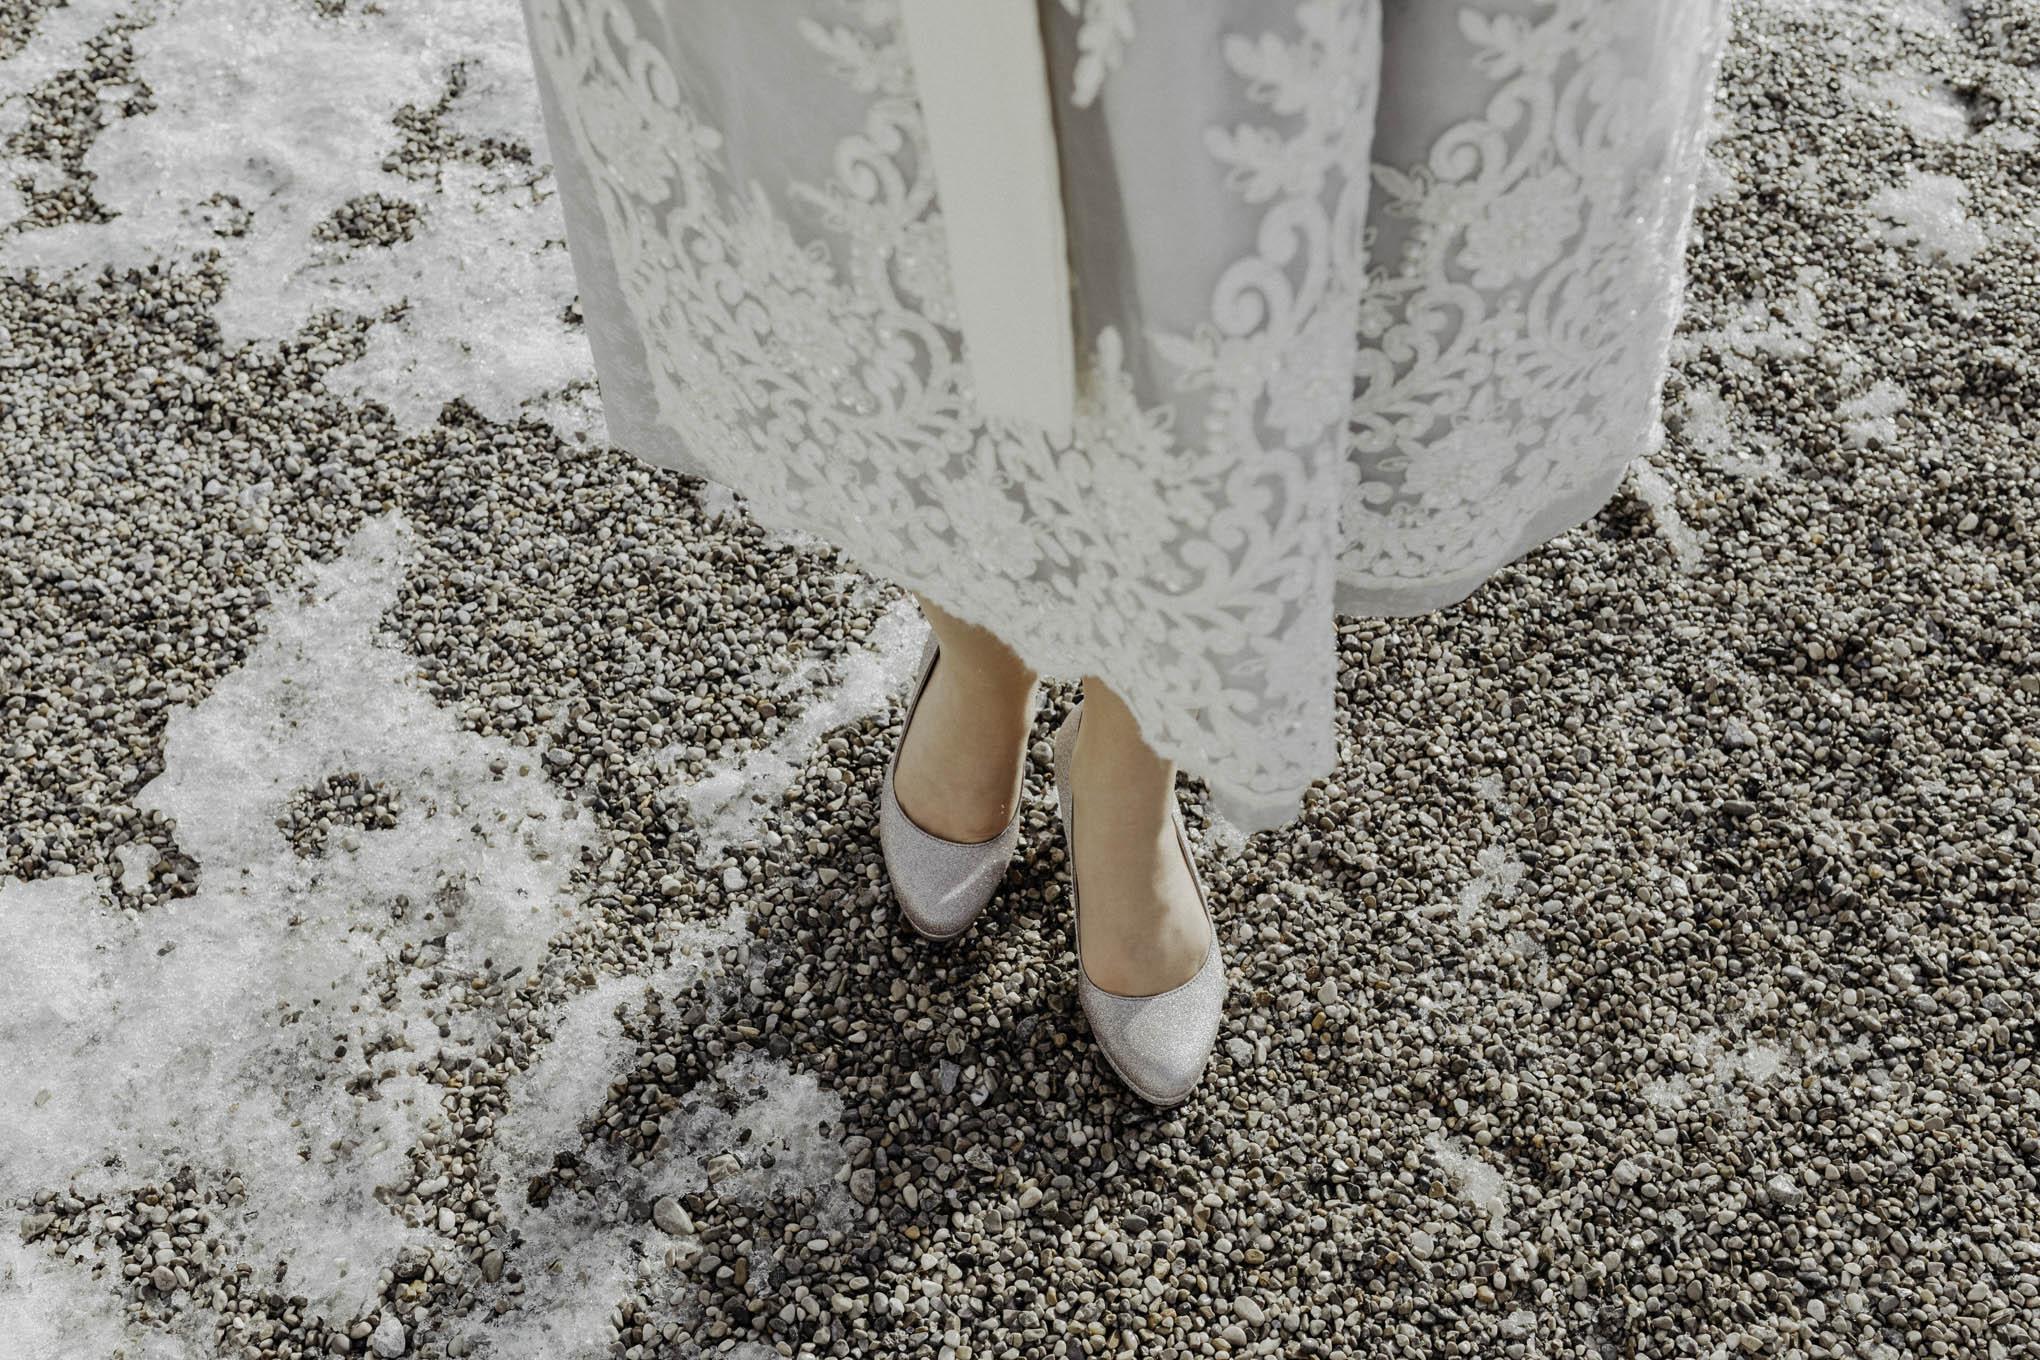 Brautschuhe im Winter